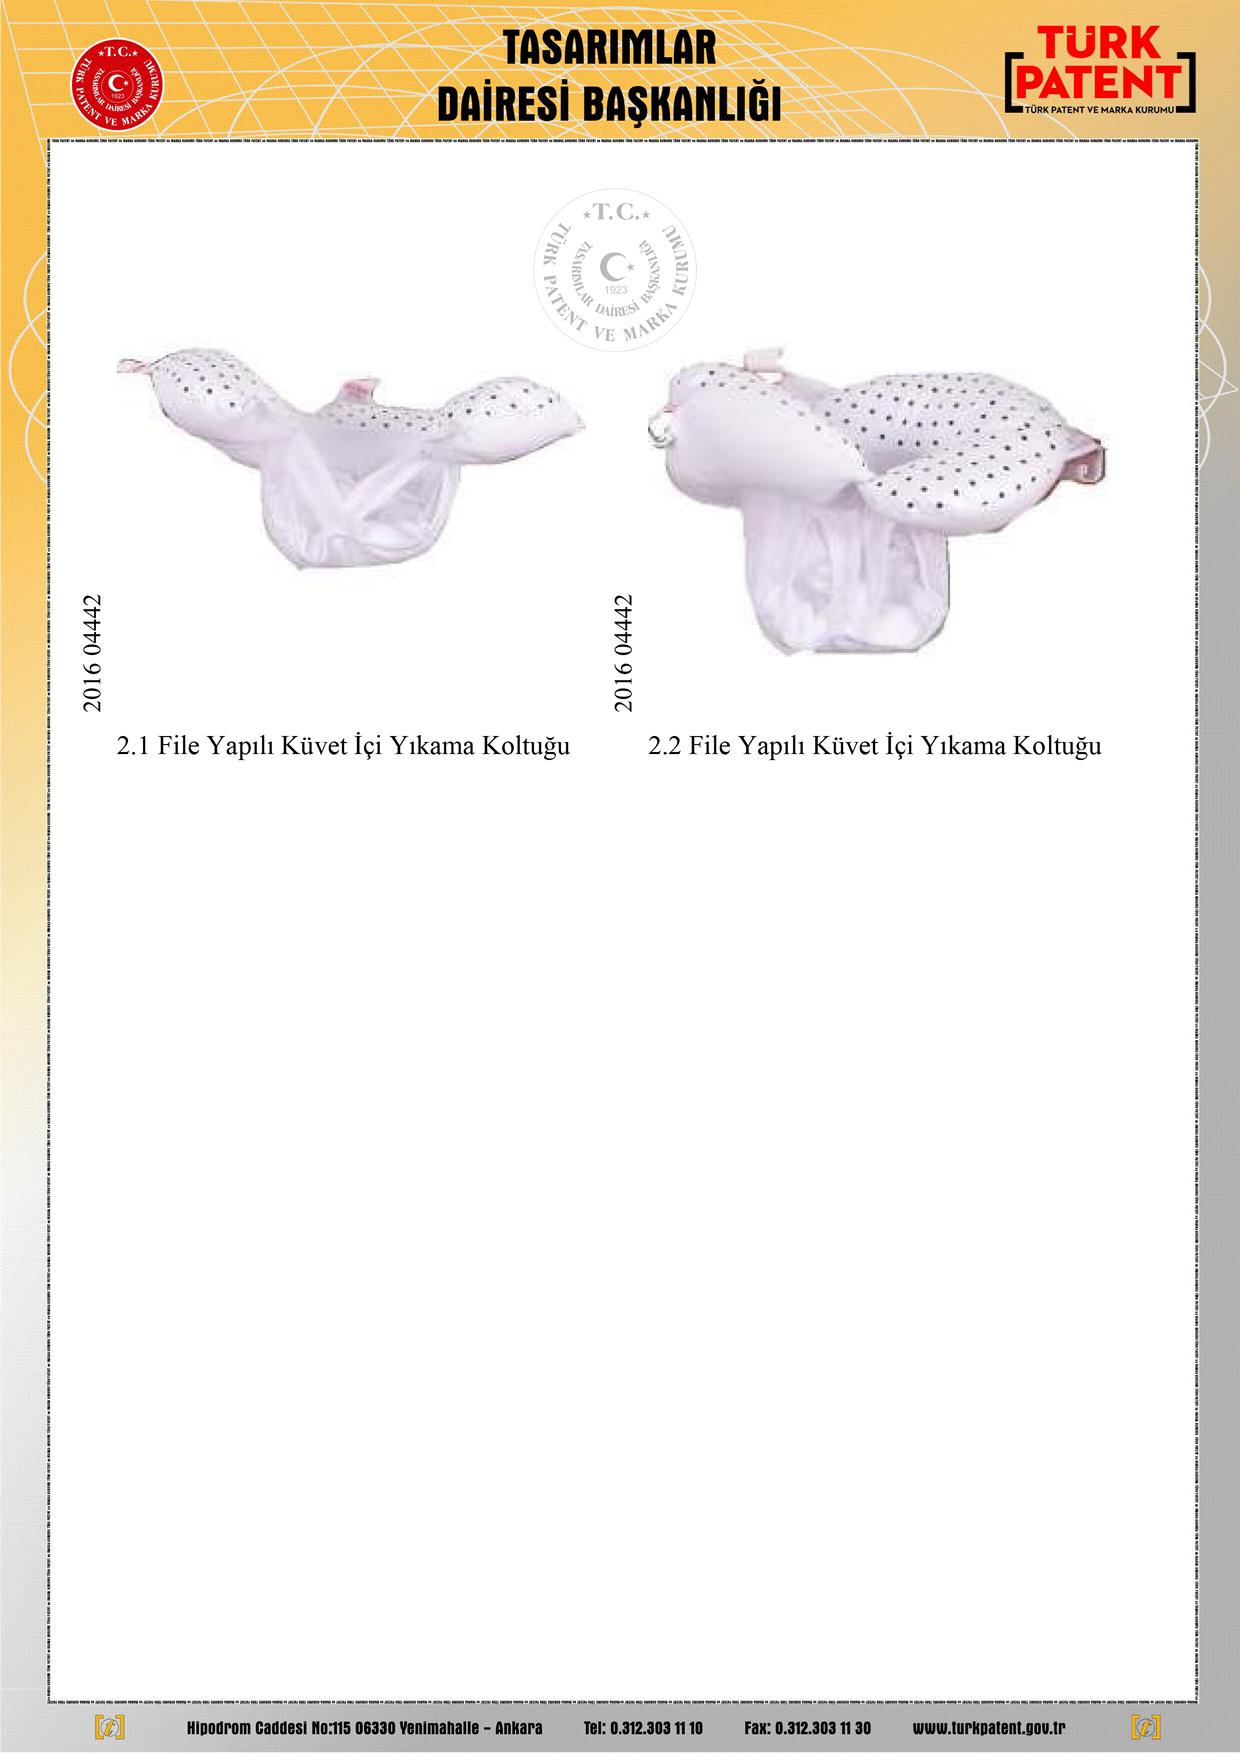 Bebek Yıkama Filesi Patent 6